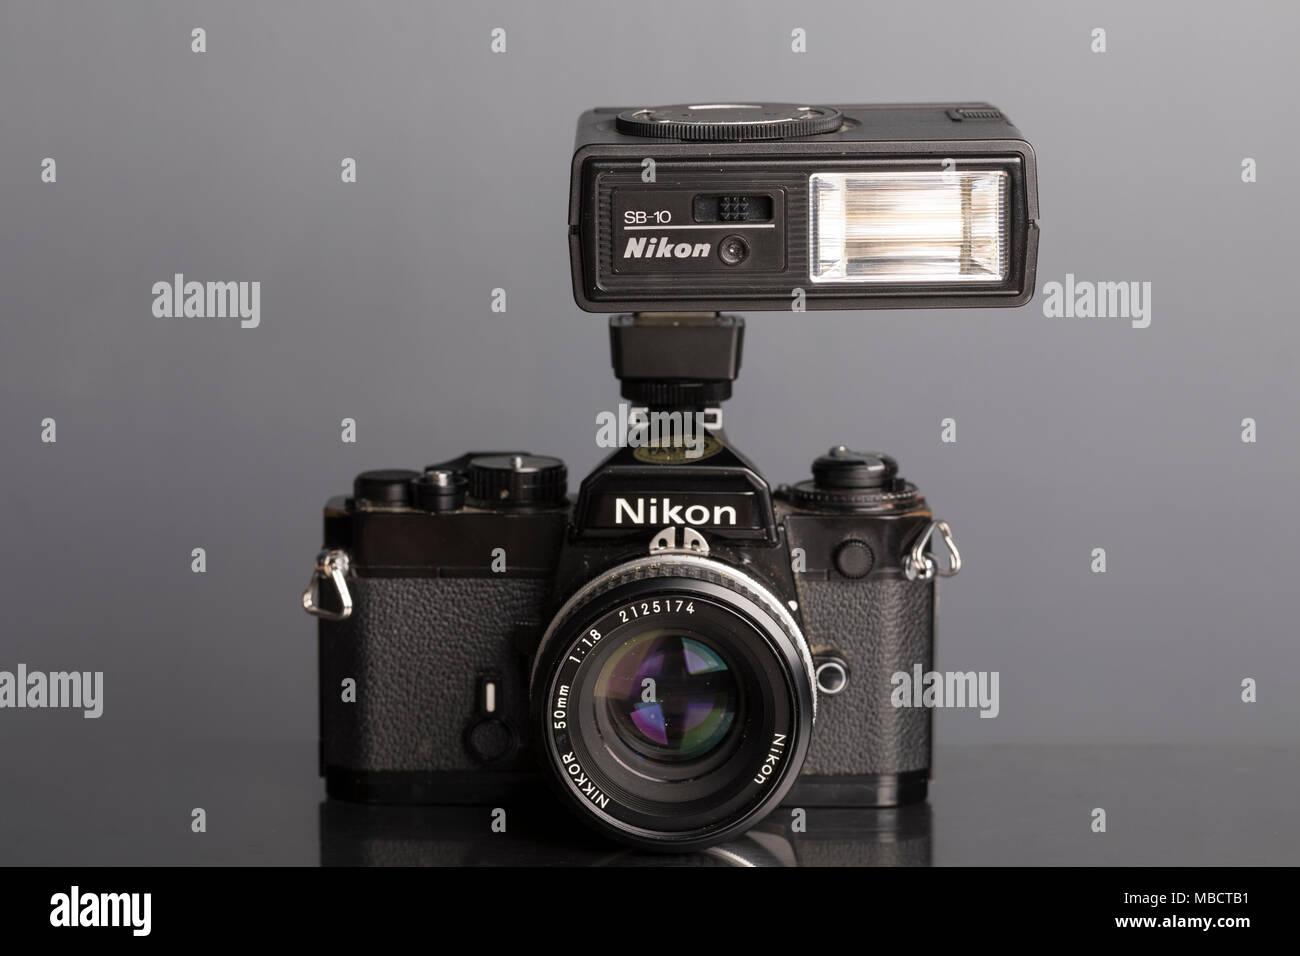 Nikon FE 35mm SLR single lens reflex film camera with SB-10 Speedlight flash - Stock Image